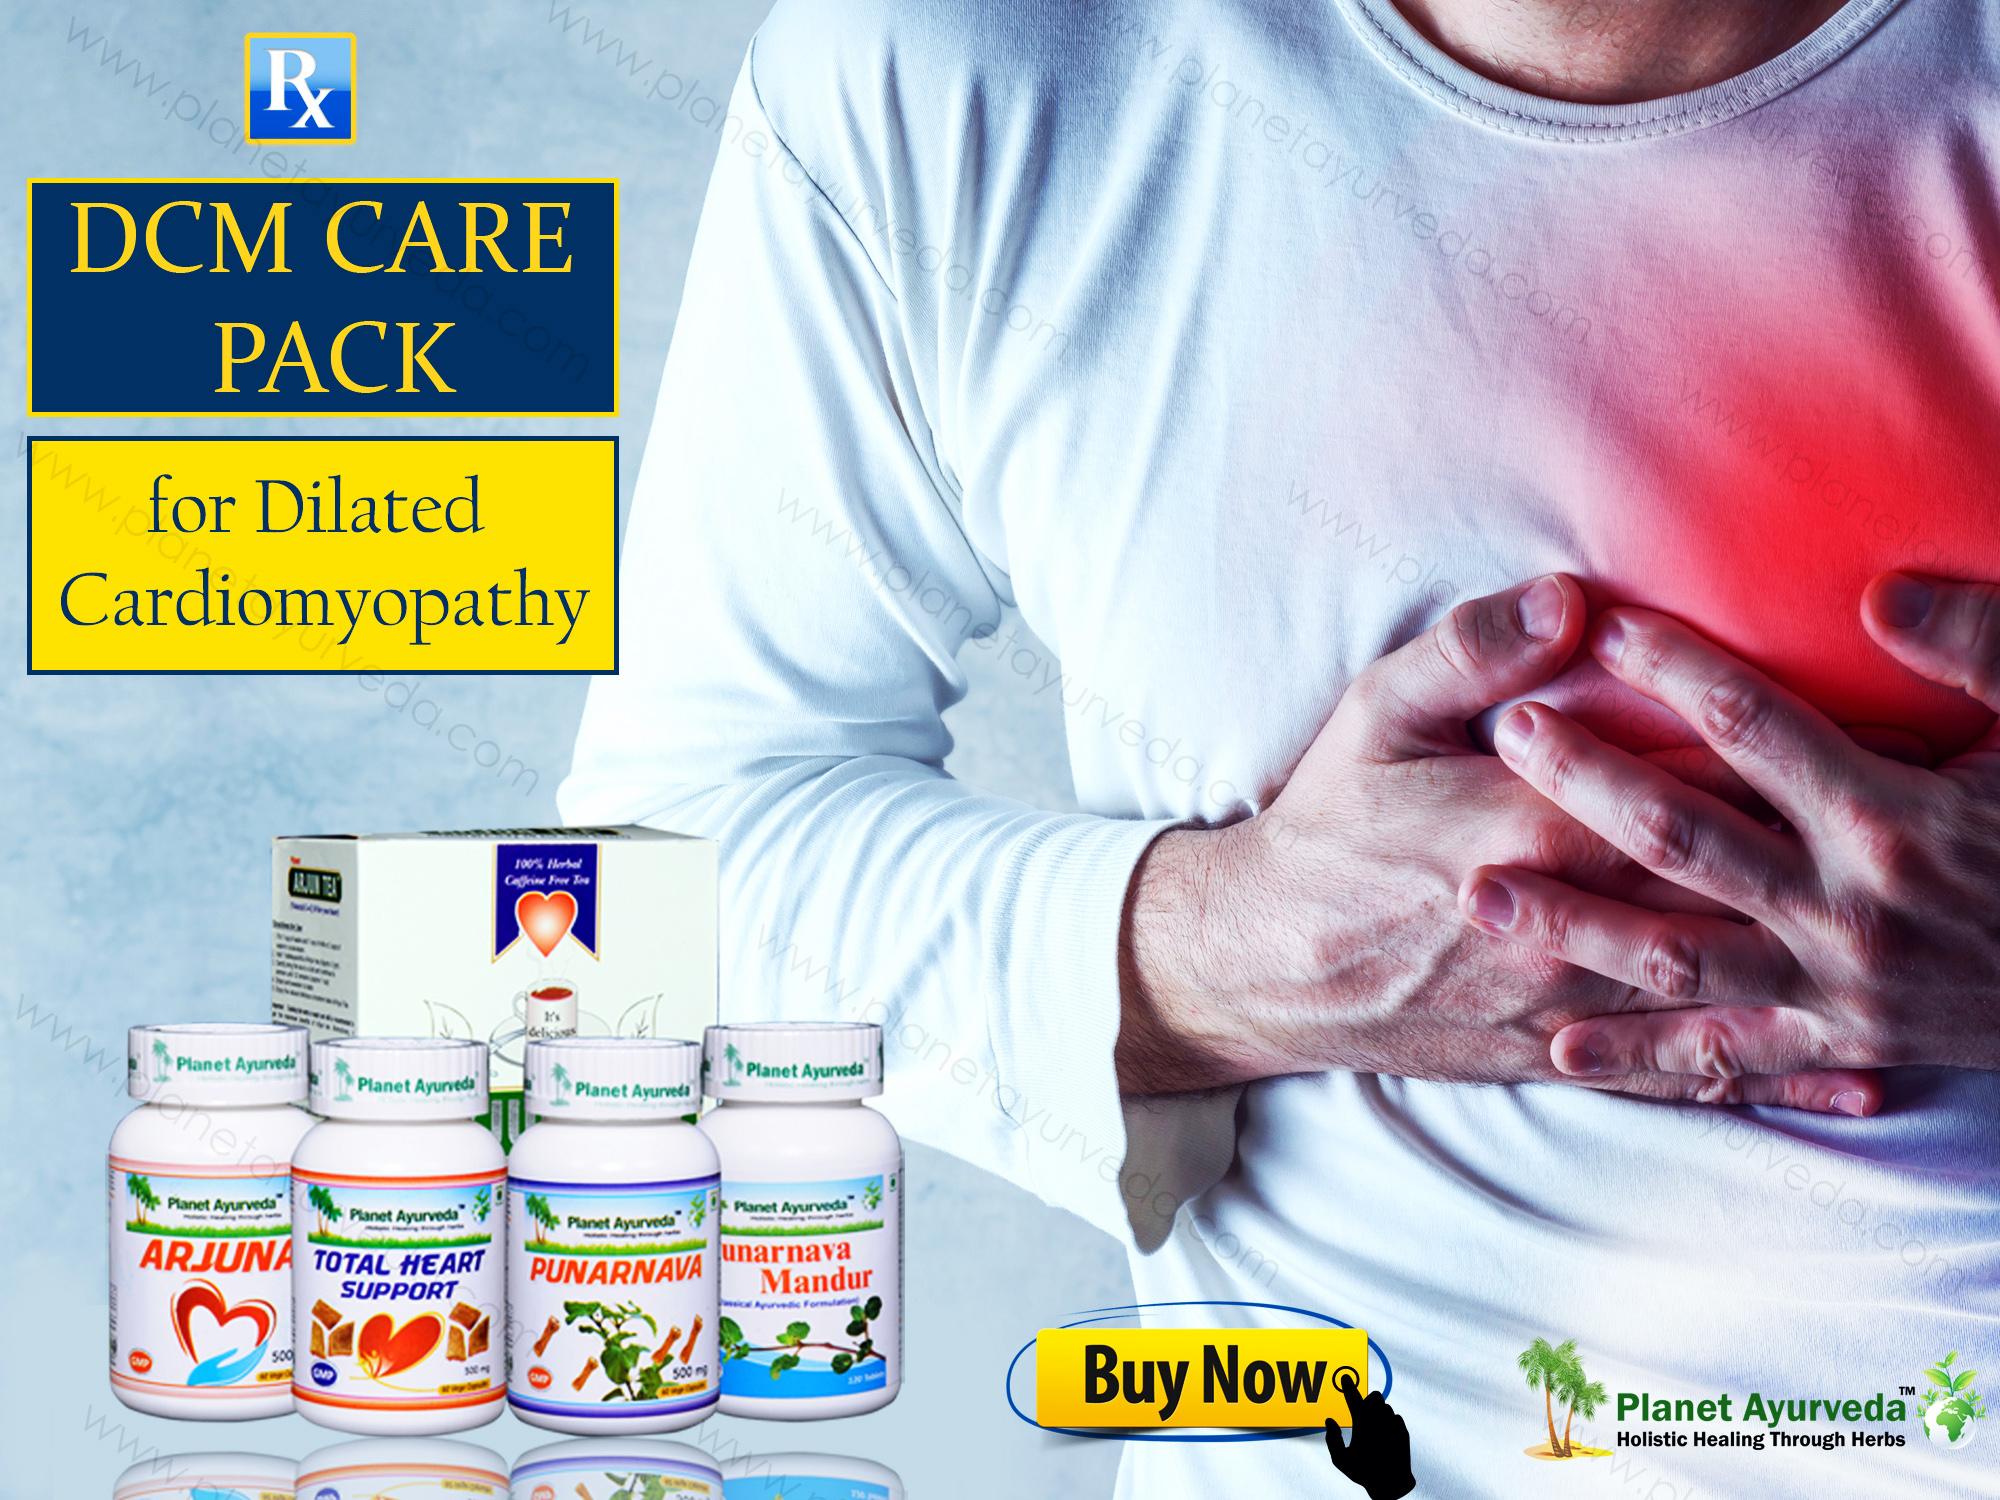 DCM Care Pack